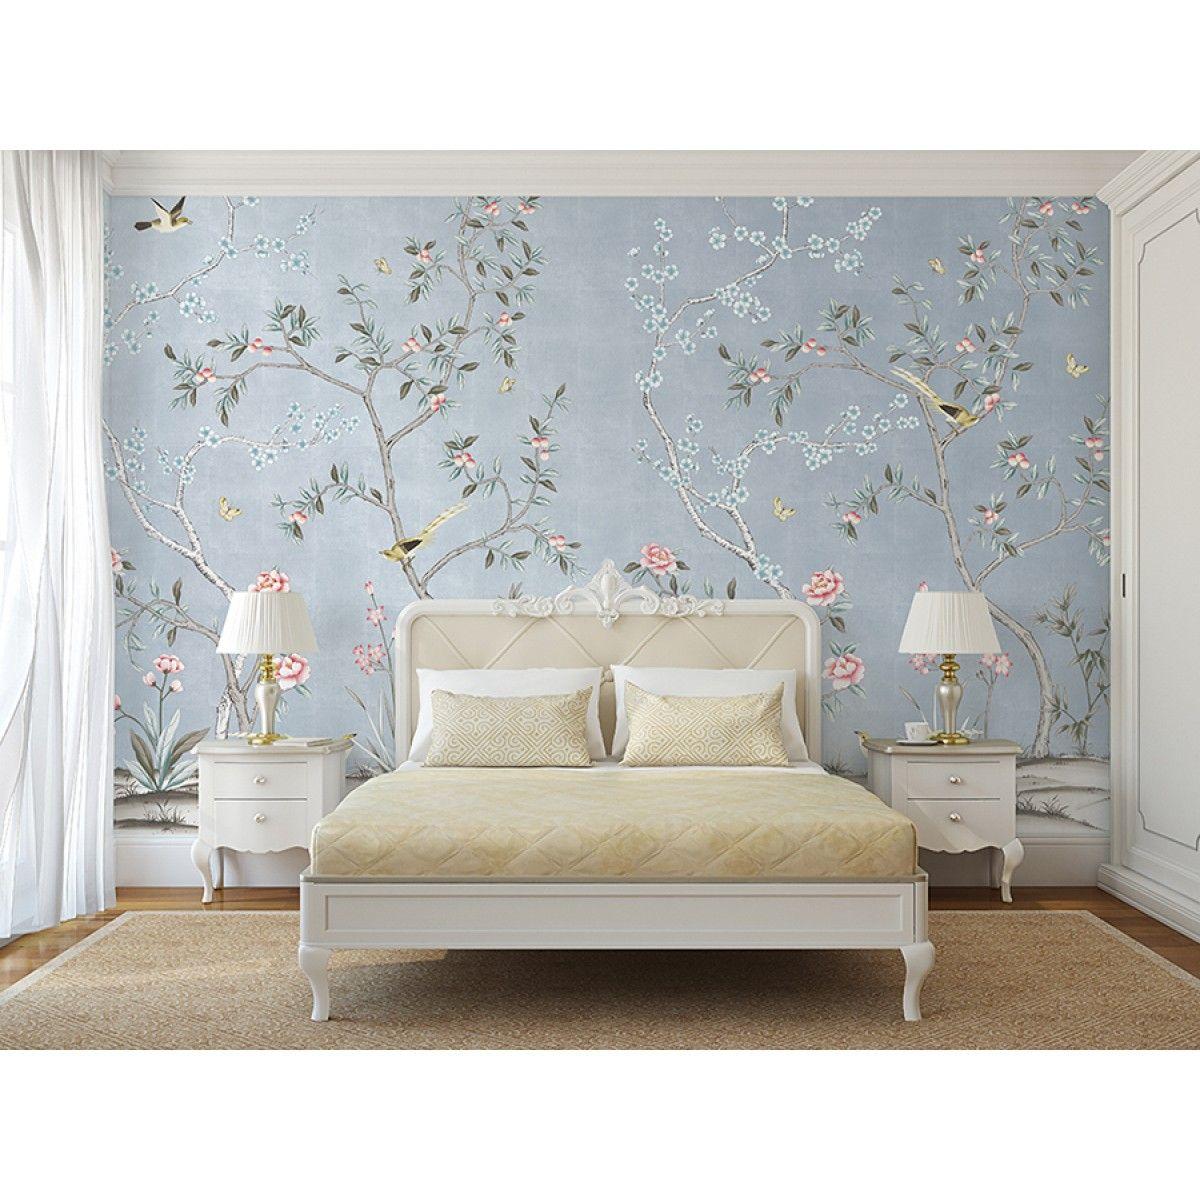 Best Chinoiserie Garden Metallic Ice Blue Diy Bedroom Decor 400 x 300